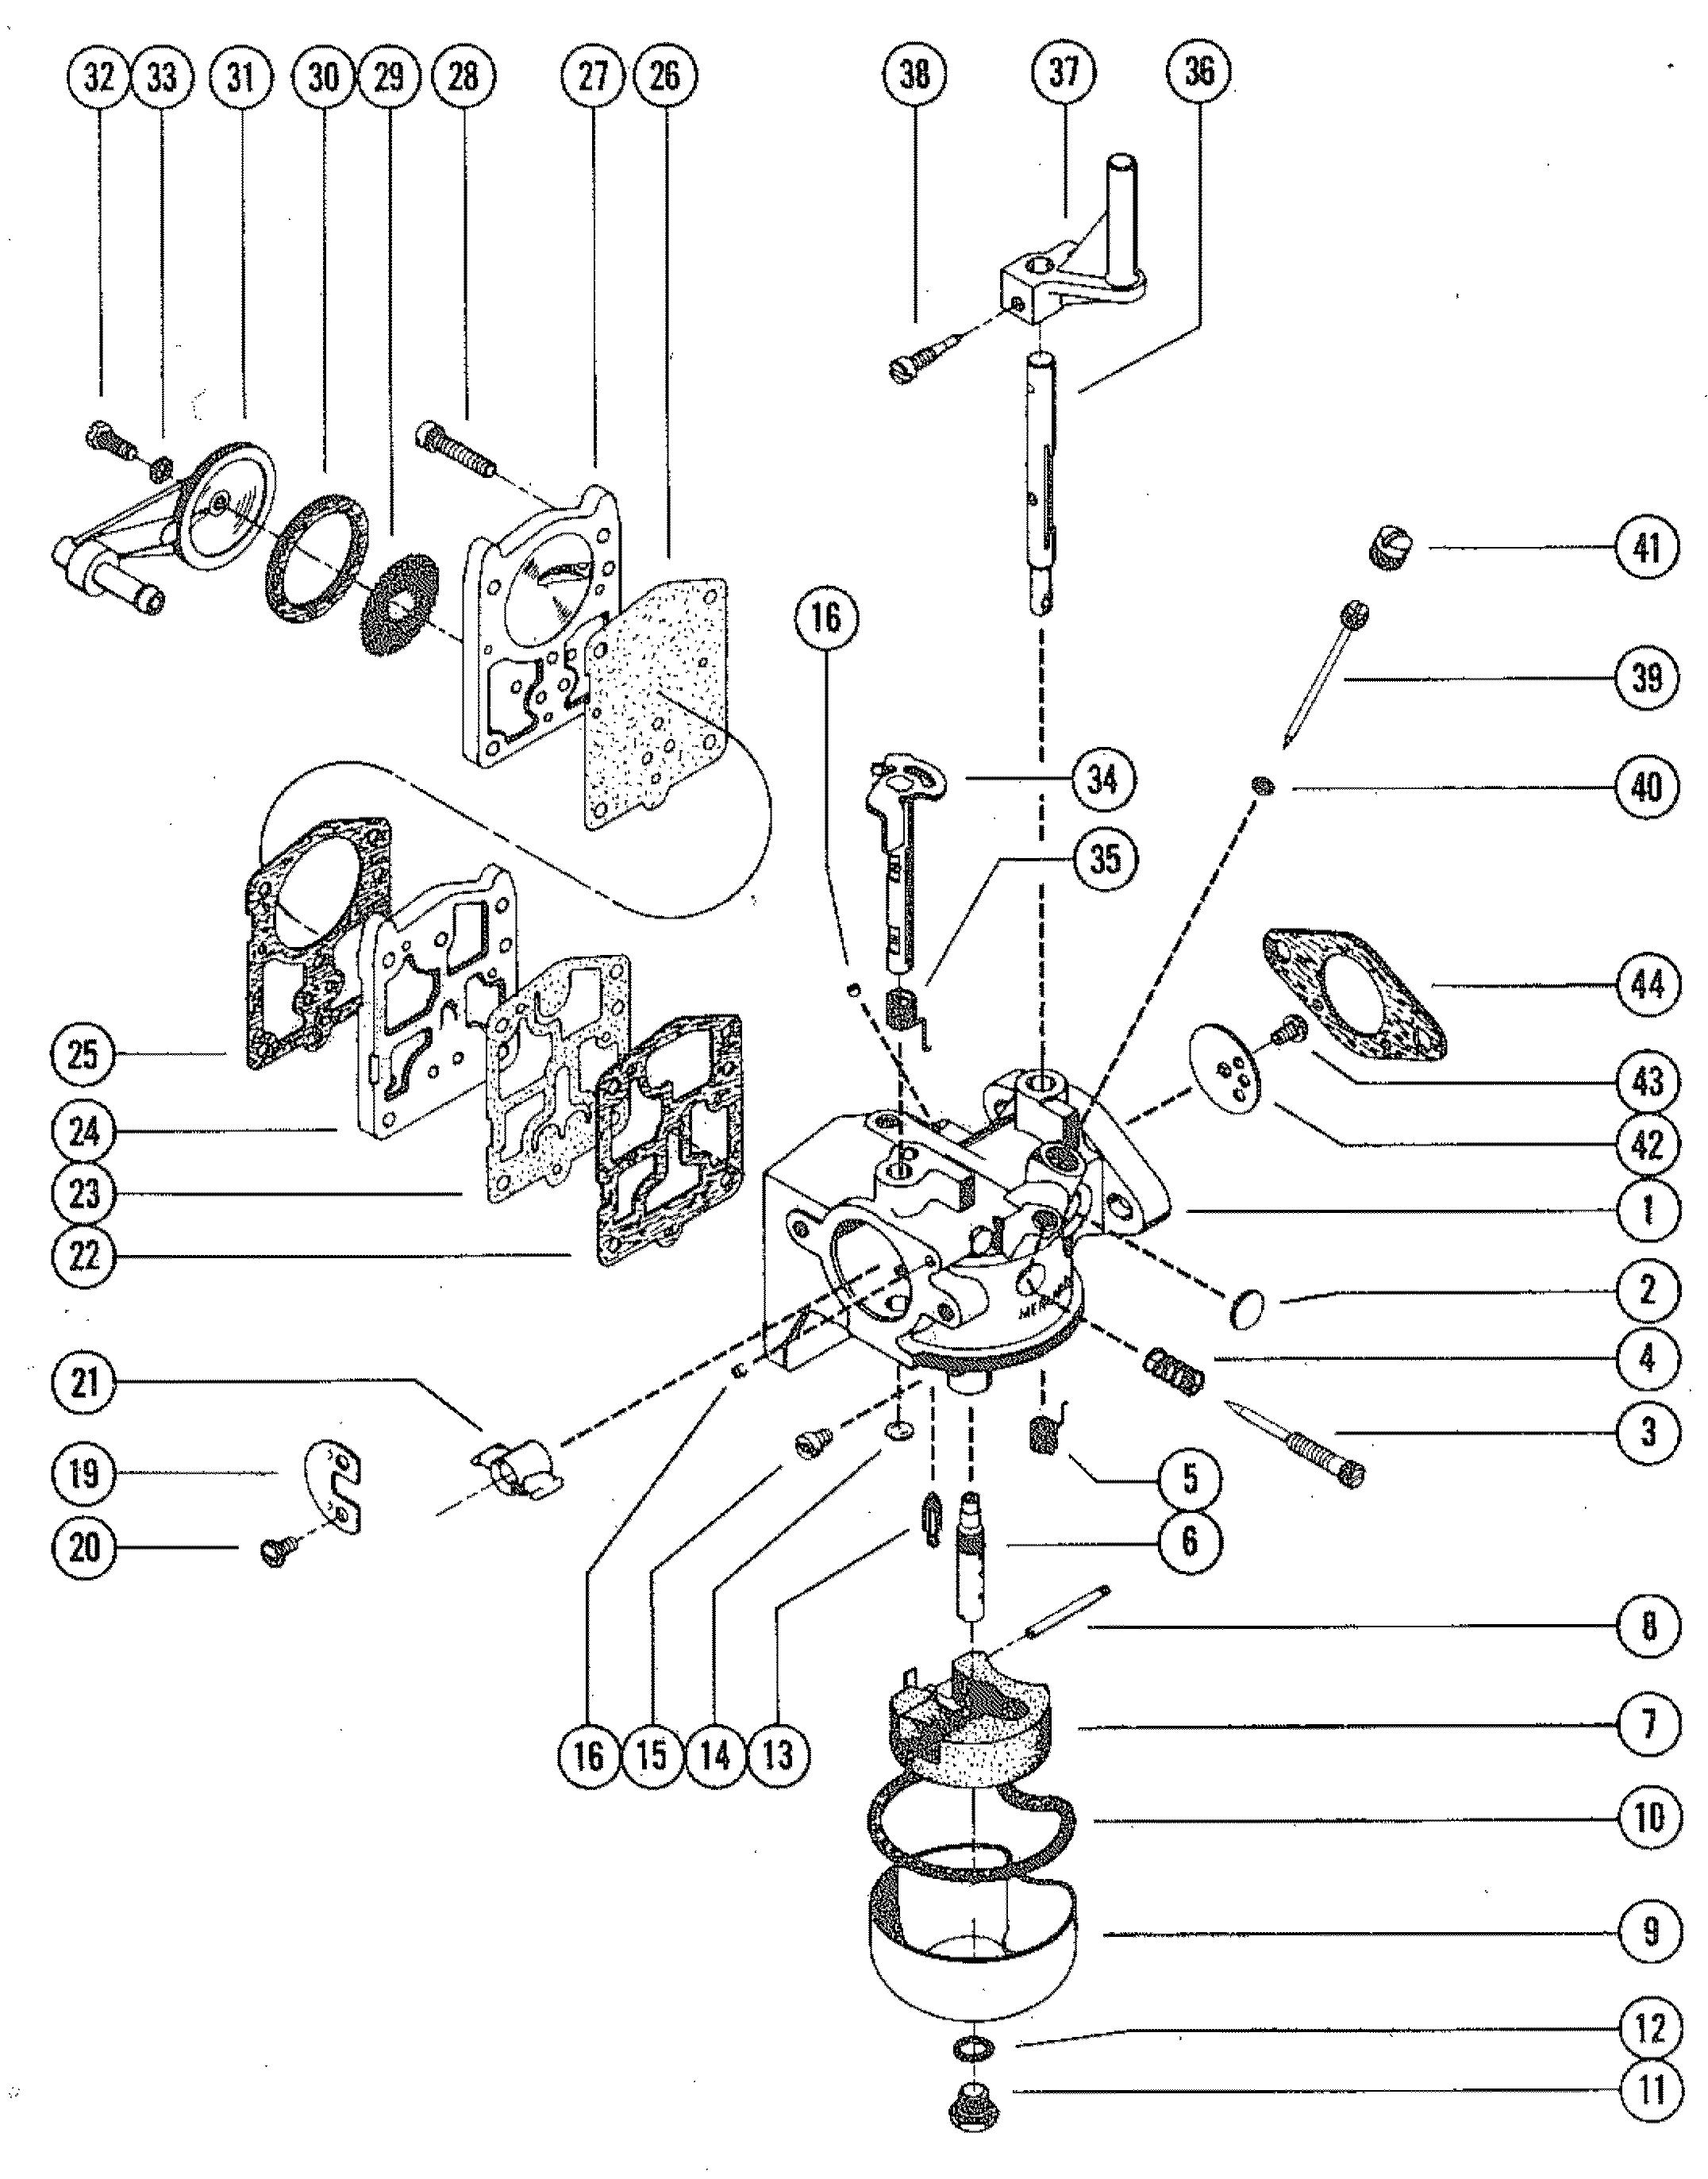 Mercury 110 Wiring Diagram Diy Diagrams Outlet Carburetor Assembly Complete For Merc Rh Jamestowndistributors Com John Deere